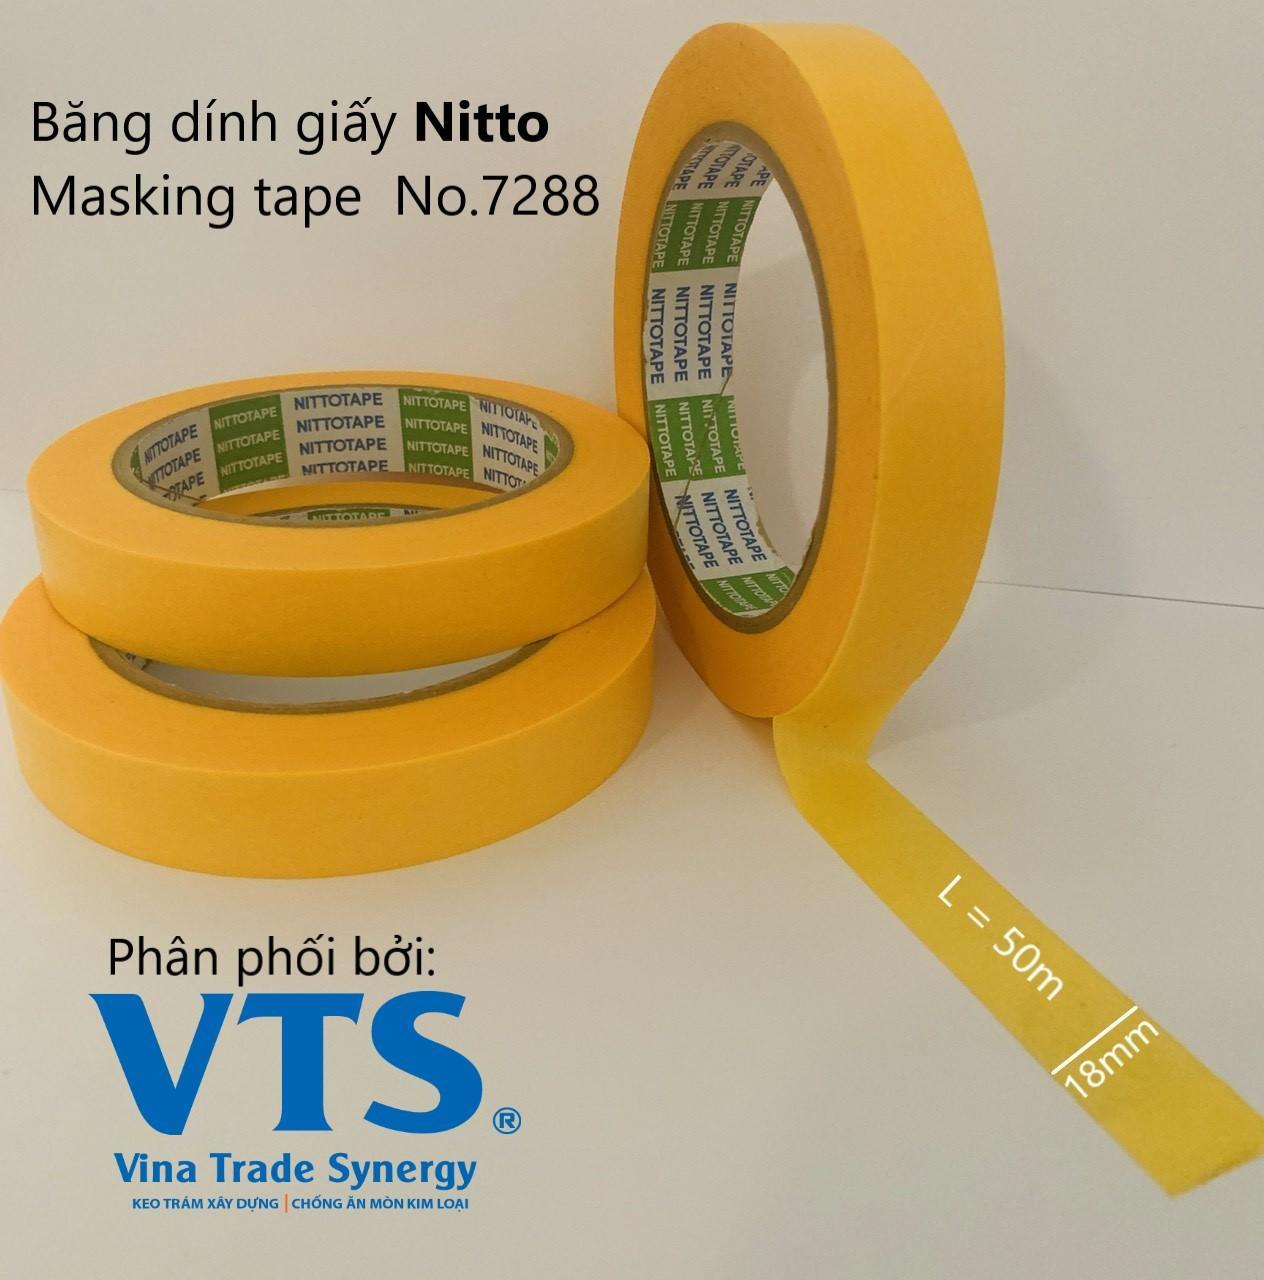 Masking tape No.7288.VTS